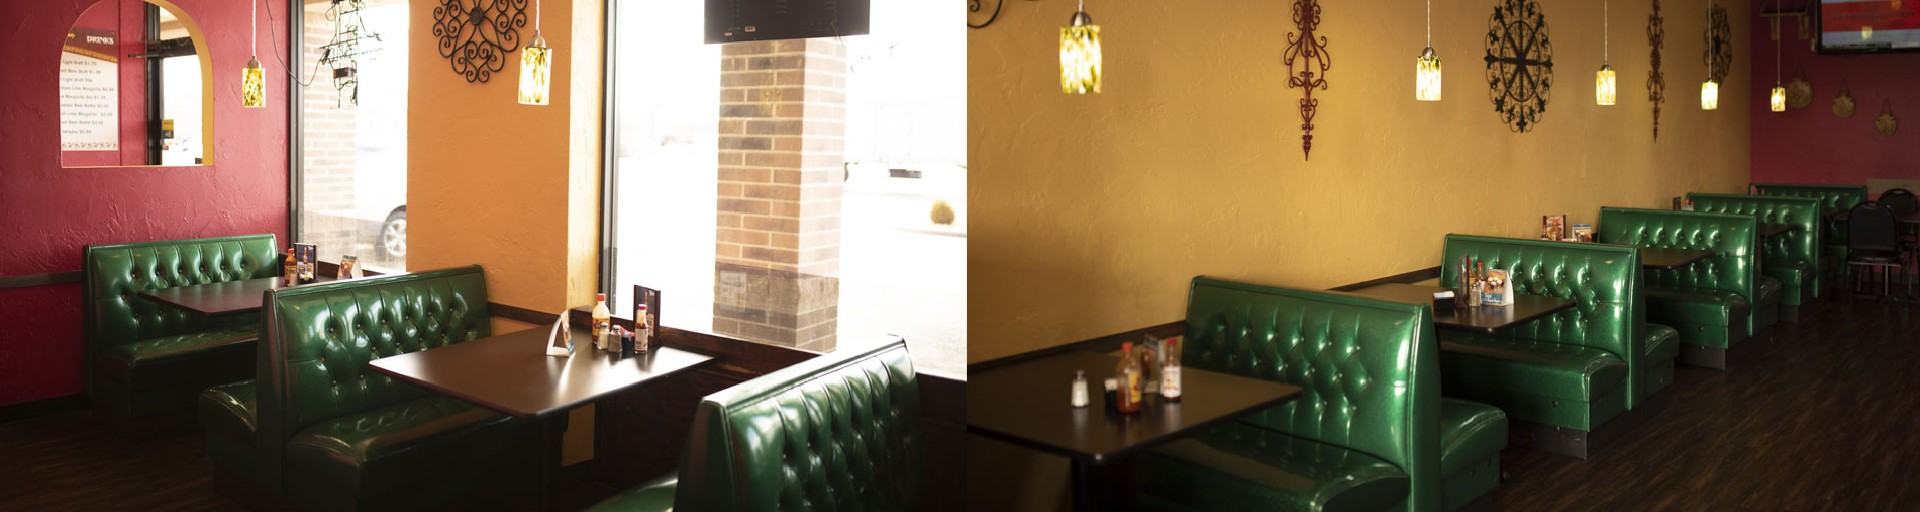 El Sombrero booths and tables